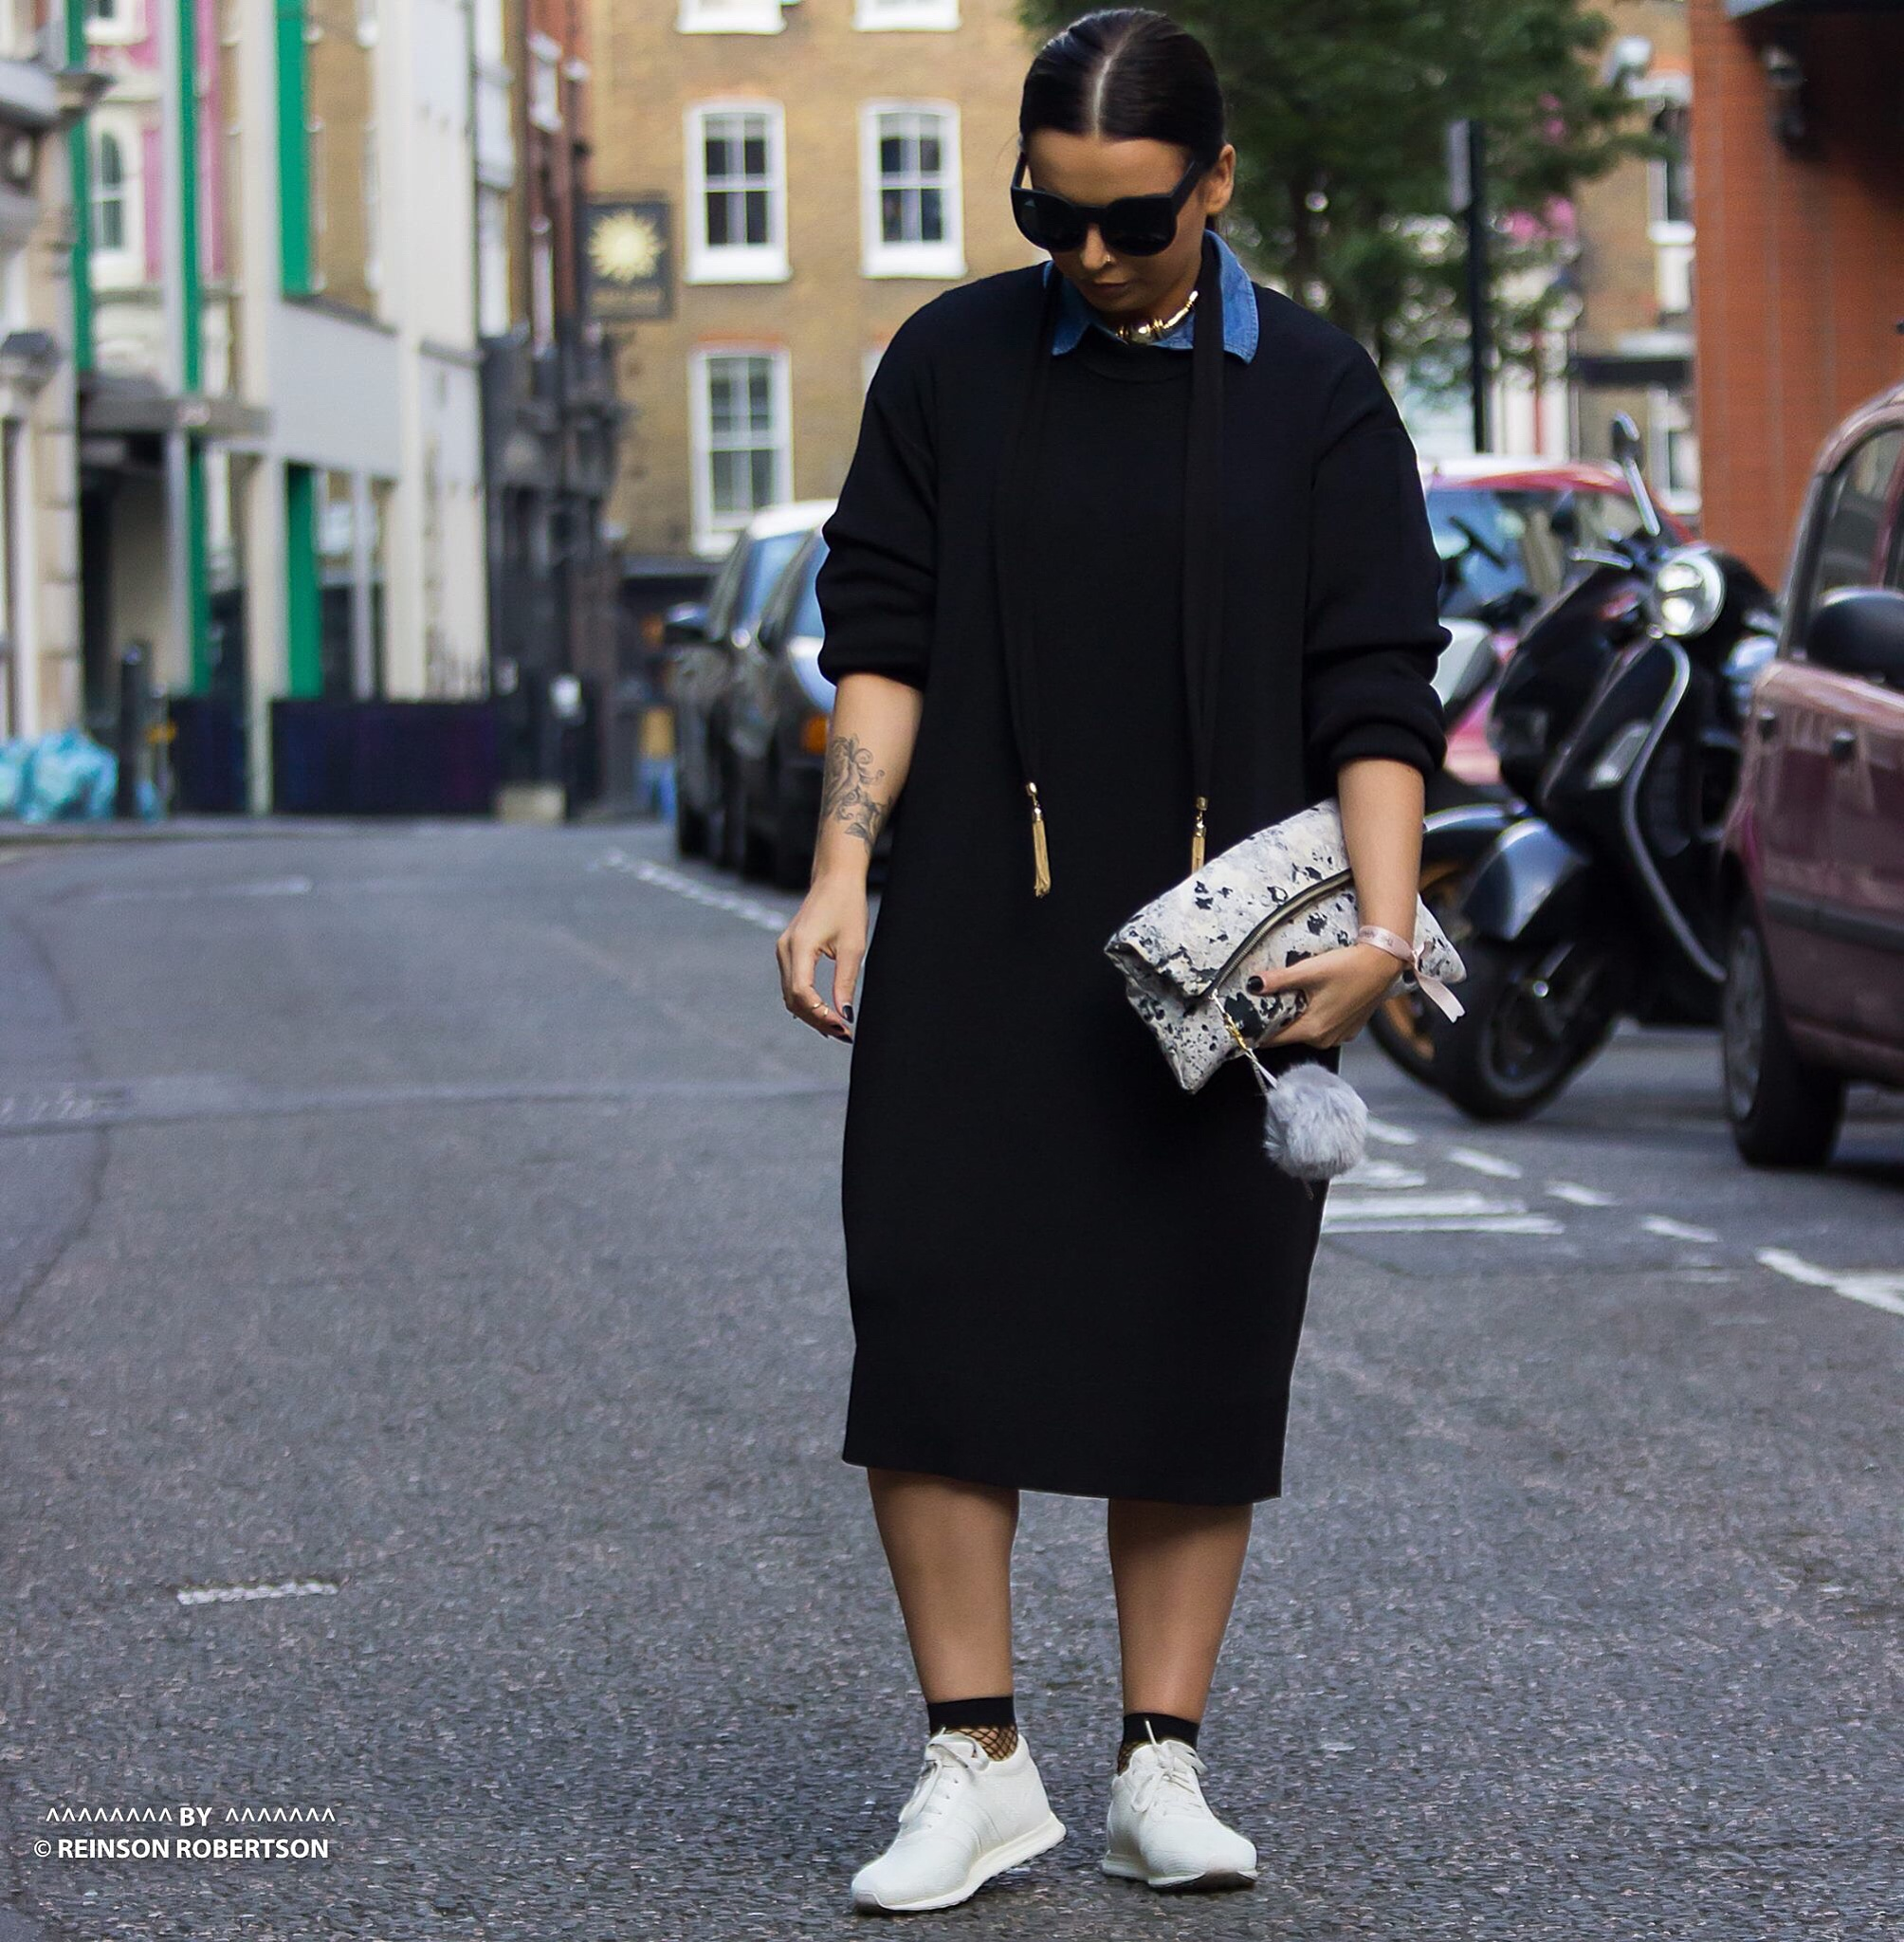 Street style  by Reinson Robertson